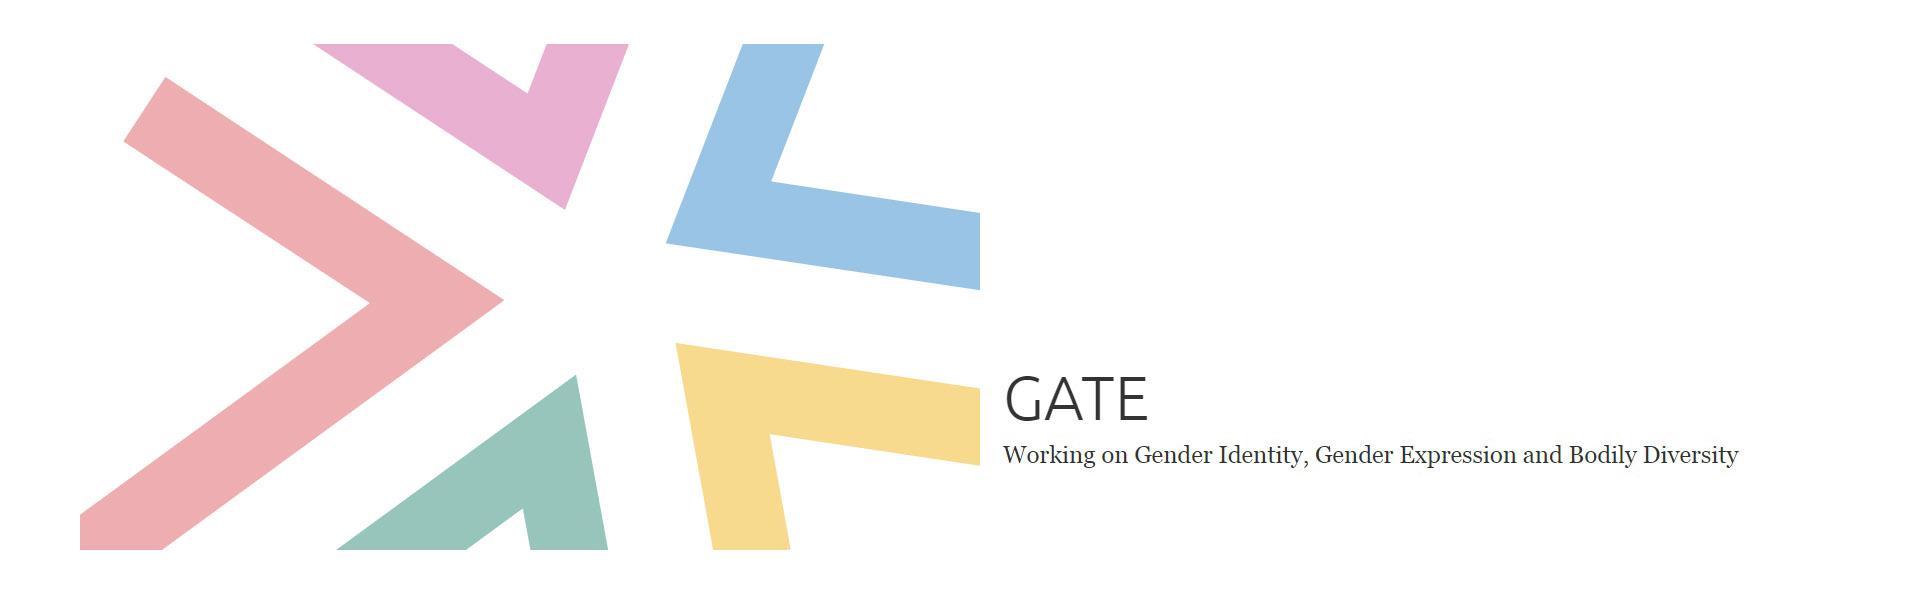 gate-logo-otdchile